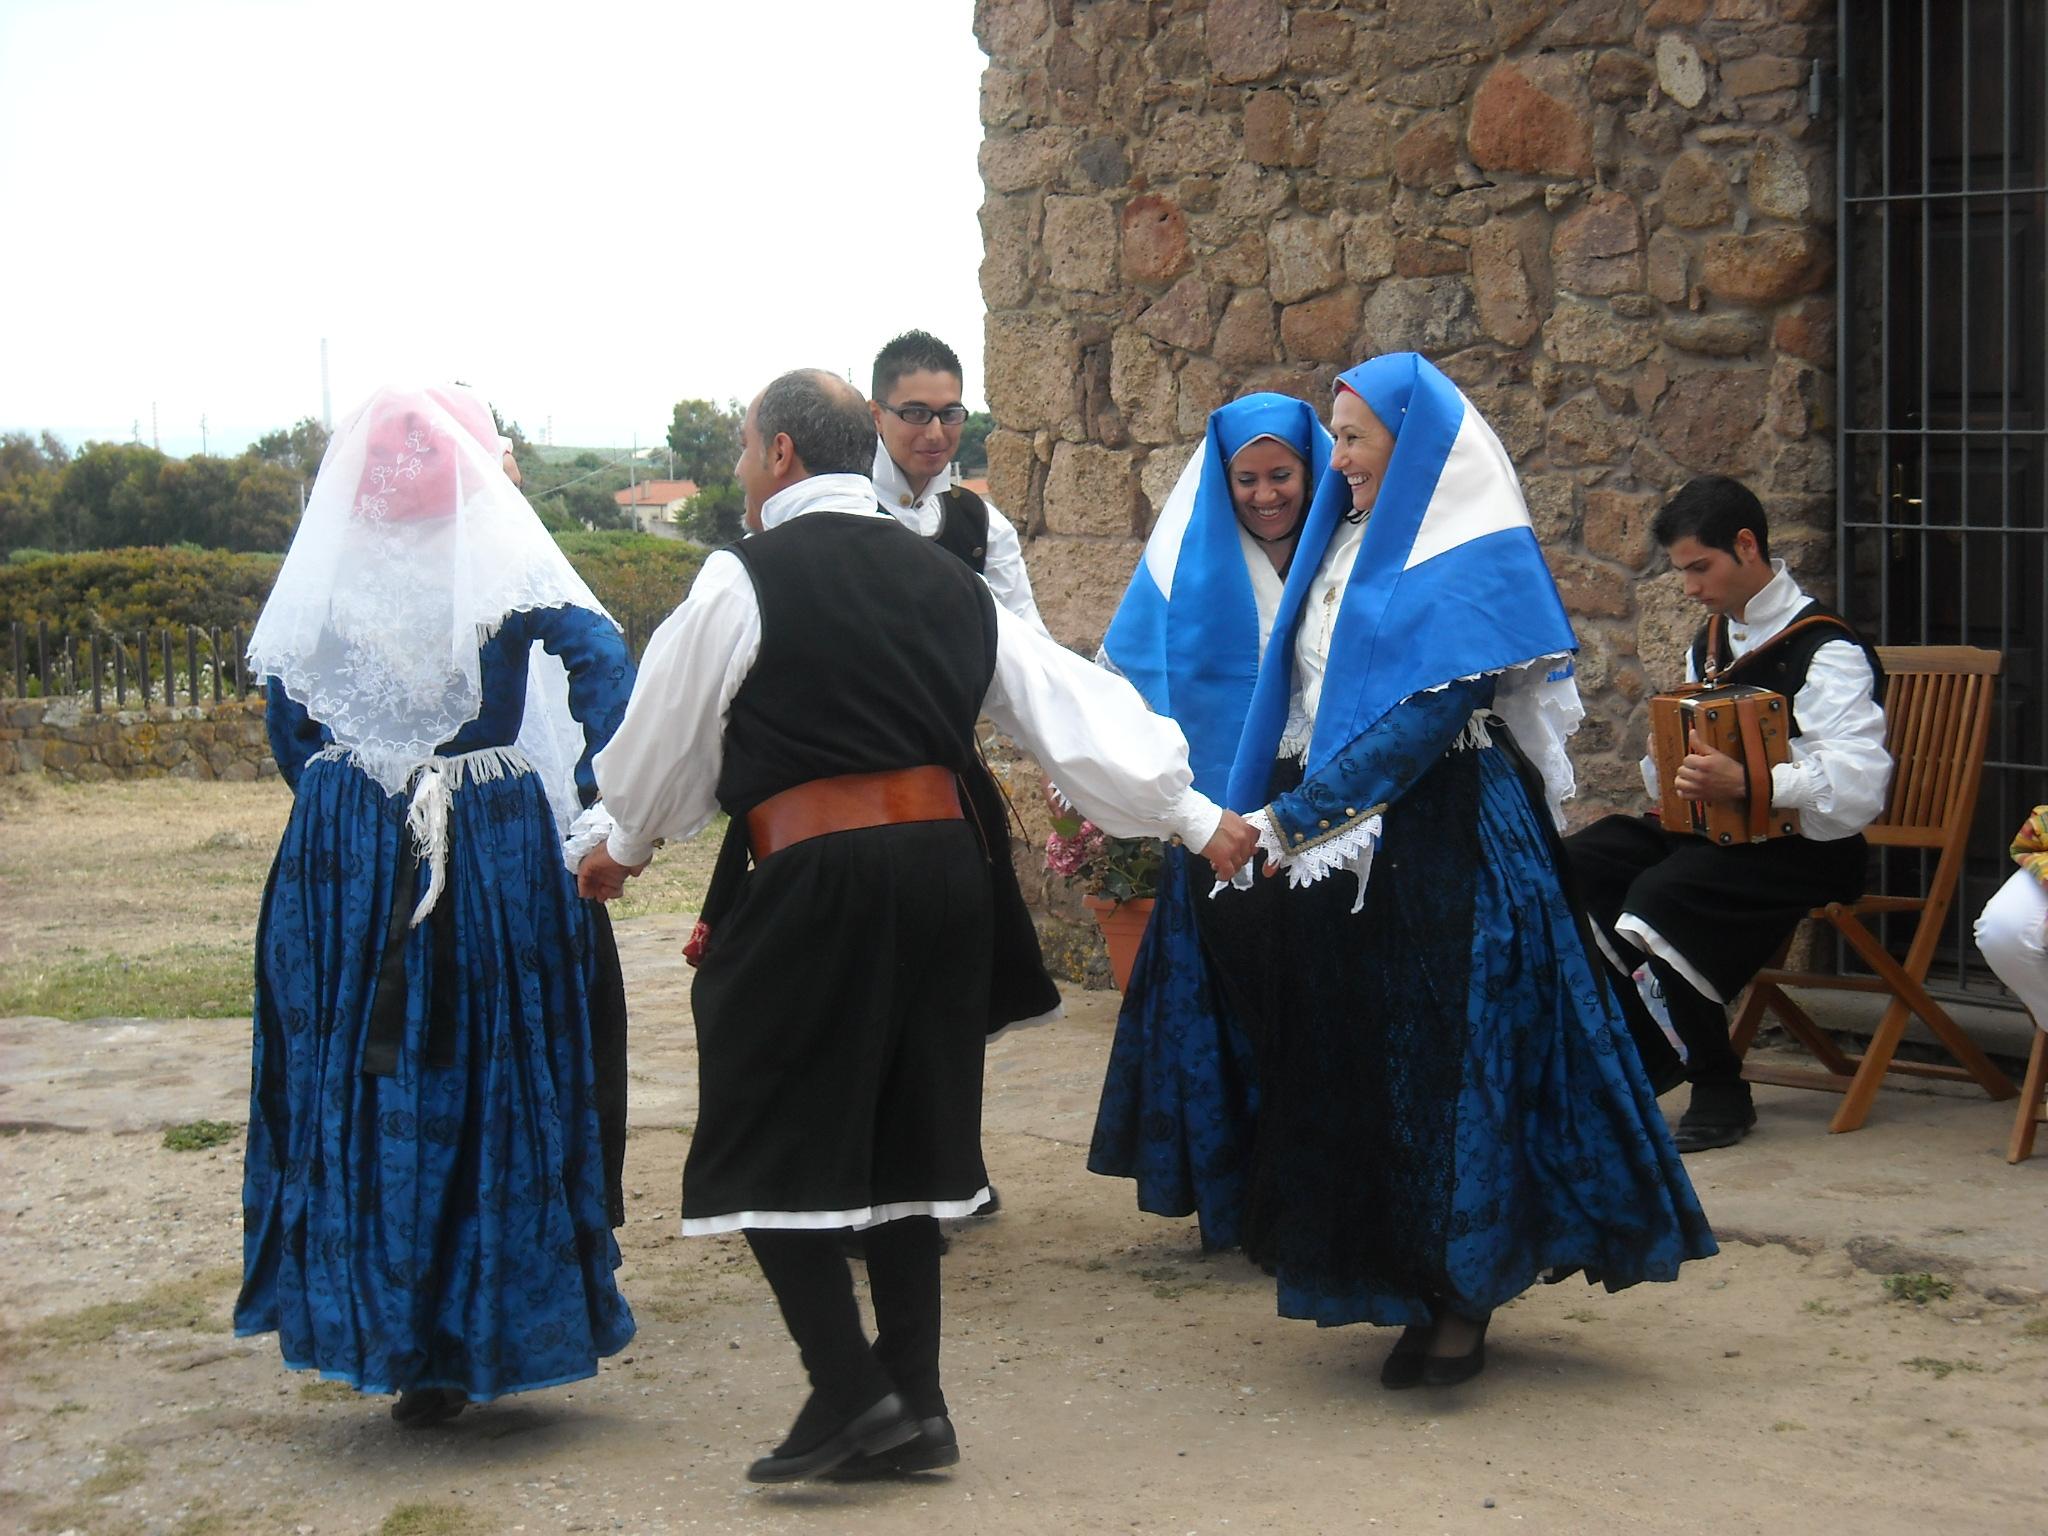 performance by Folk group Maria Carta, Gonnesa;